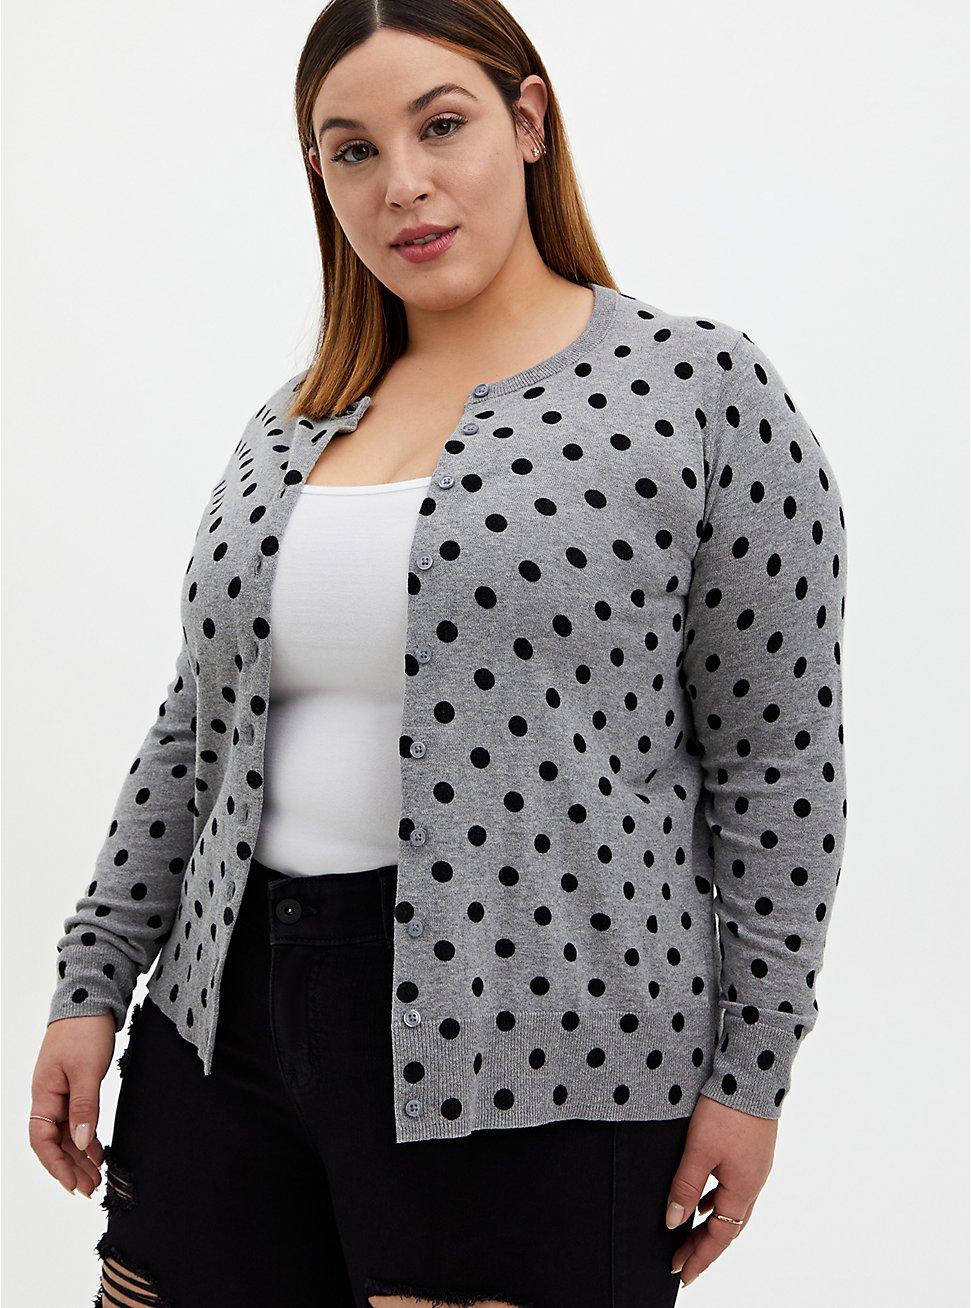 Heather Grey & Black Polka Dot Cotton Button Front Cardigan, DOTS - GREY, hi-res